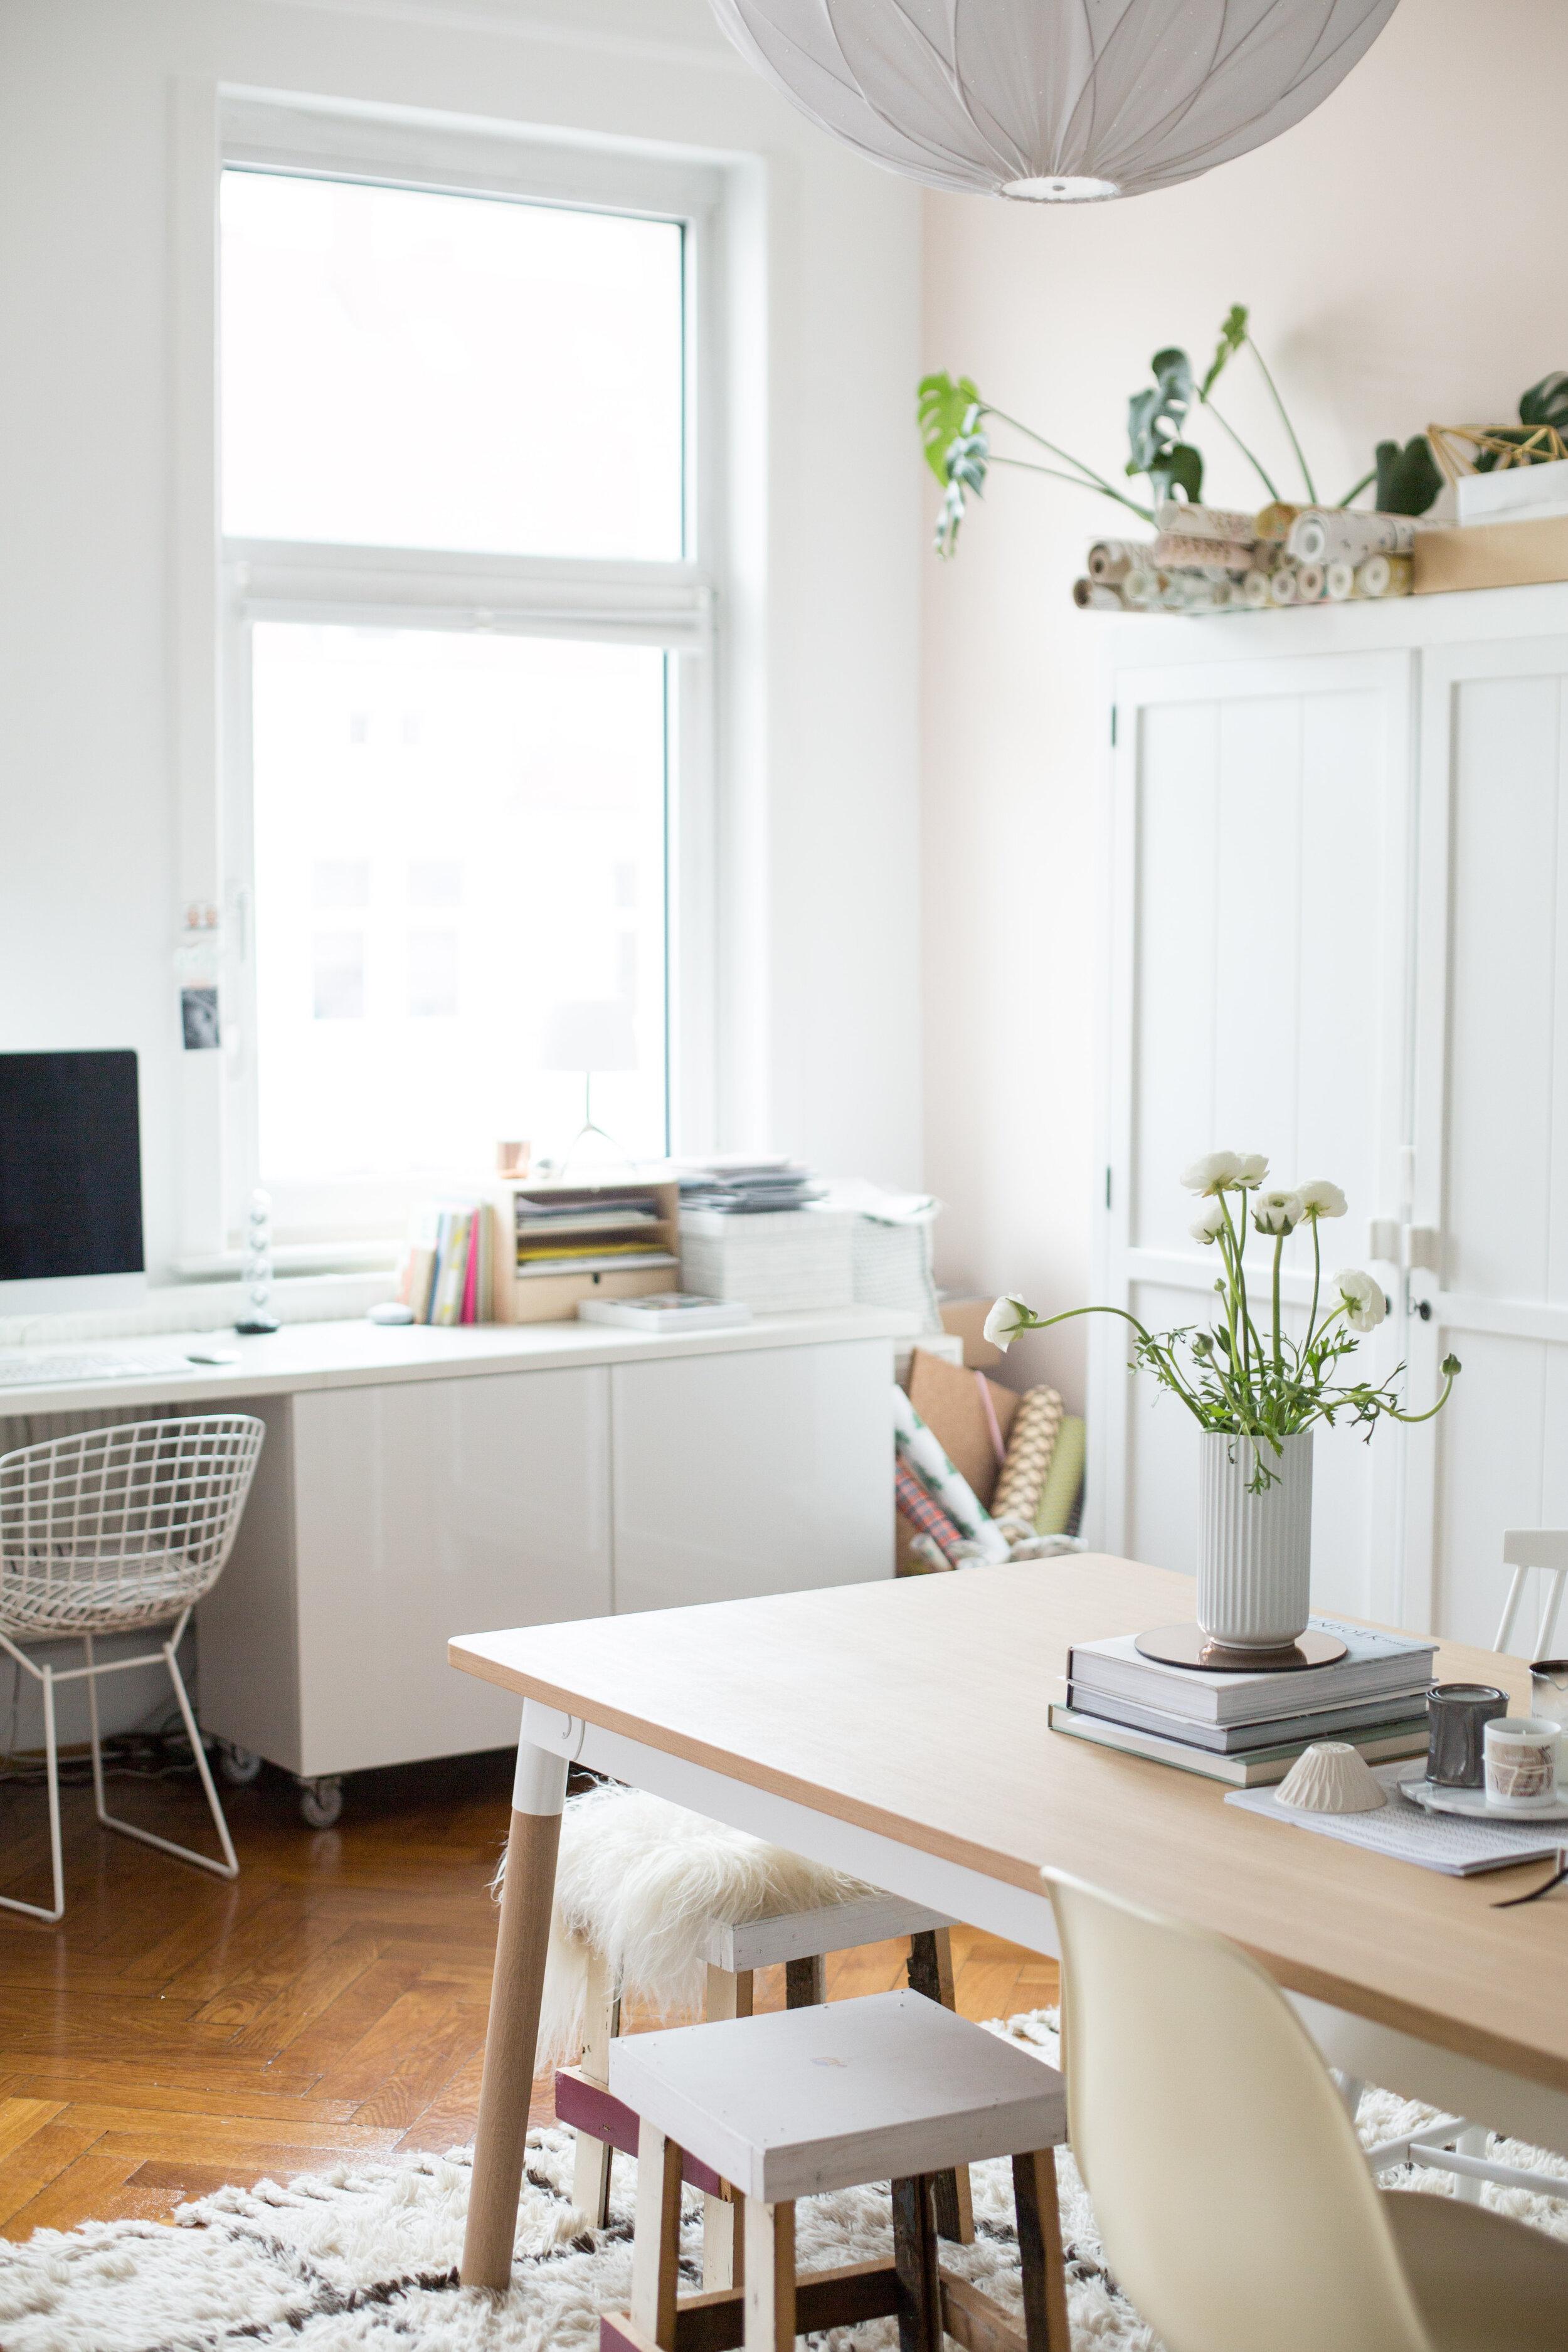 30dayhomelove Instagram Home Styling Challenge Decor8